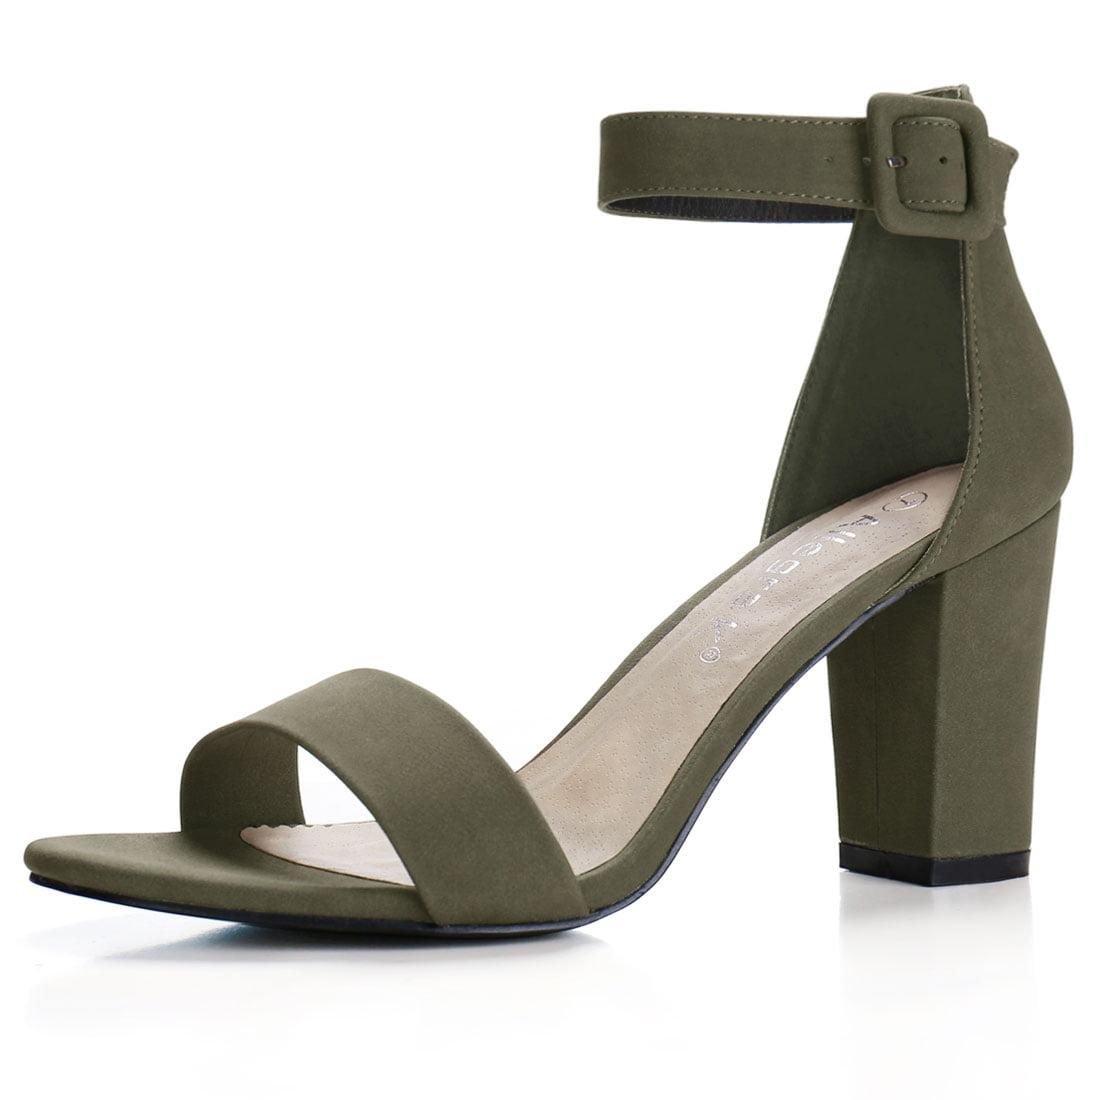 aff2d748f8a2 Allegra K Women s Open Toe Chunky High Heel Ankle Strap Sandals Camel US 7.5